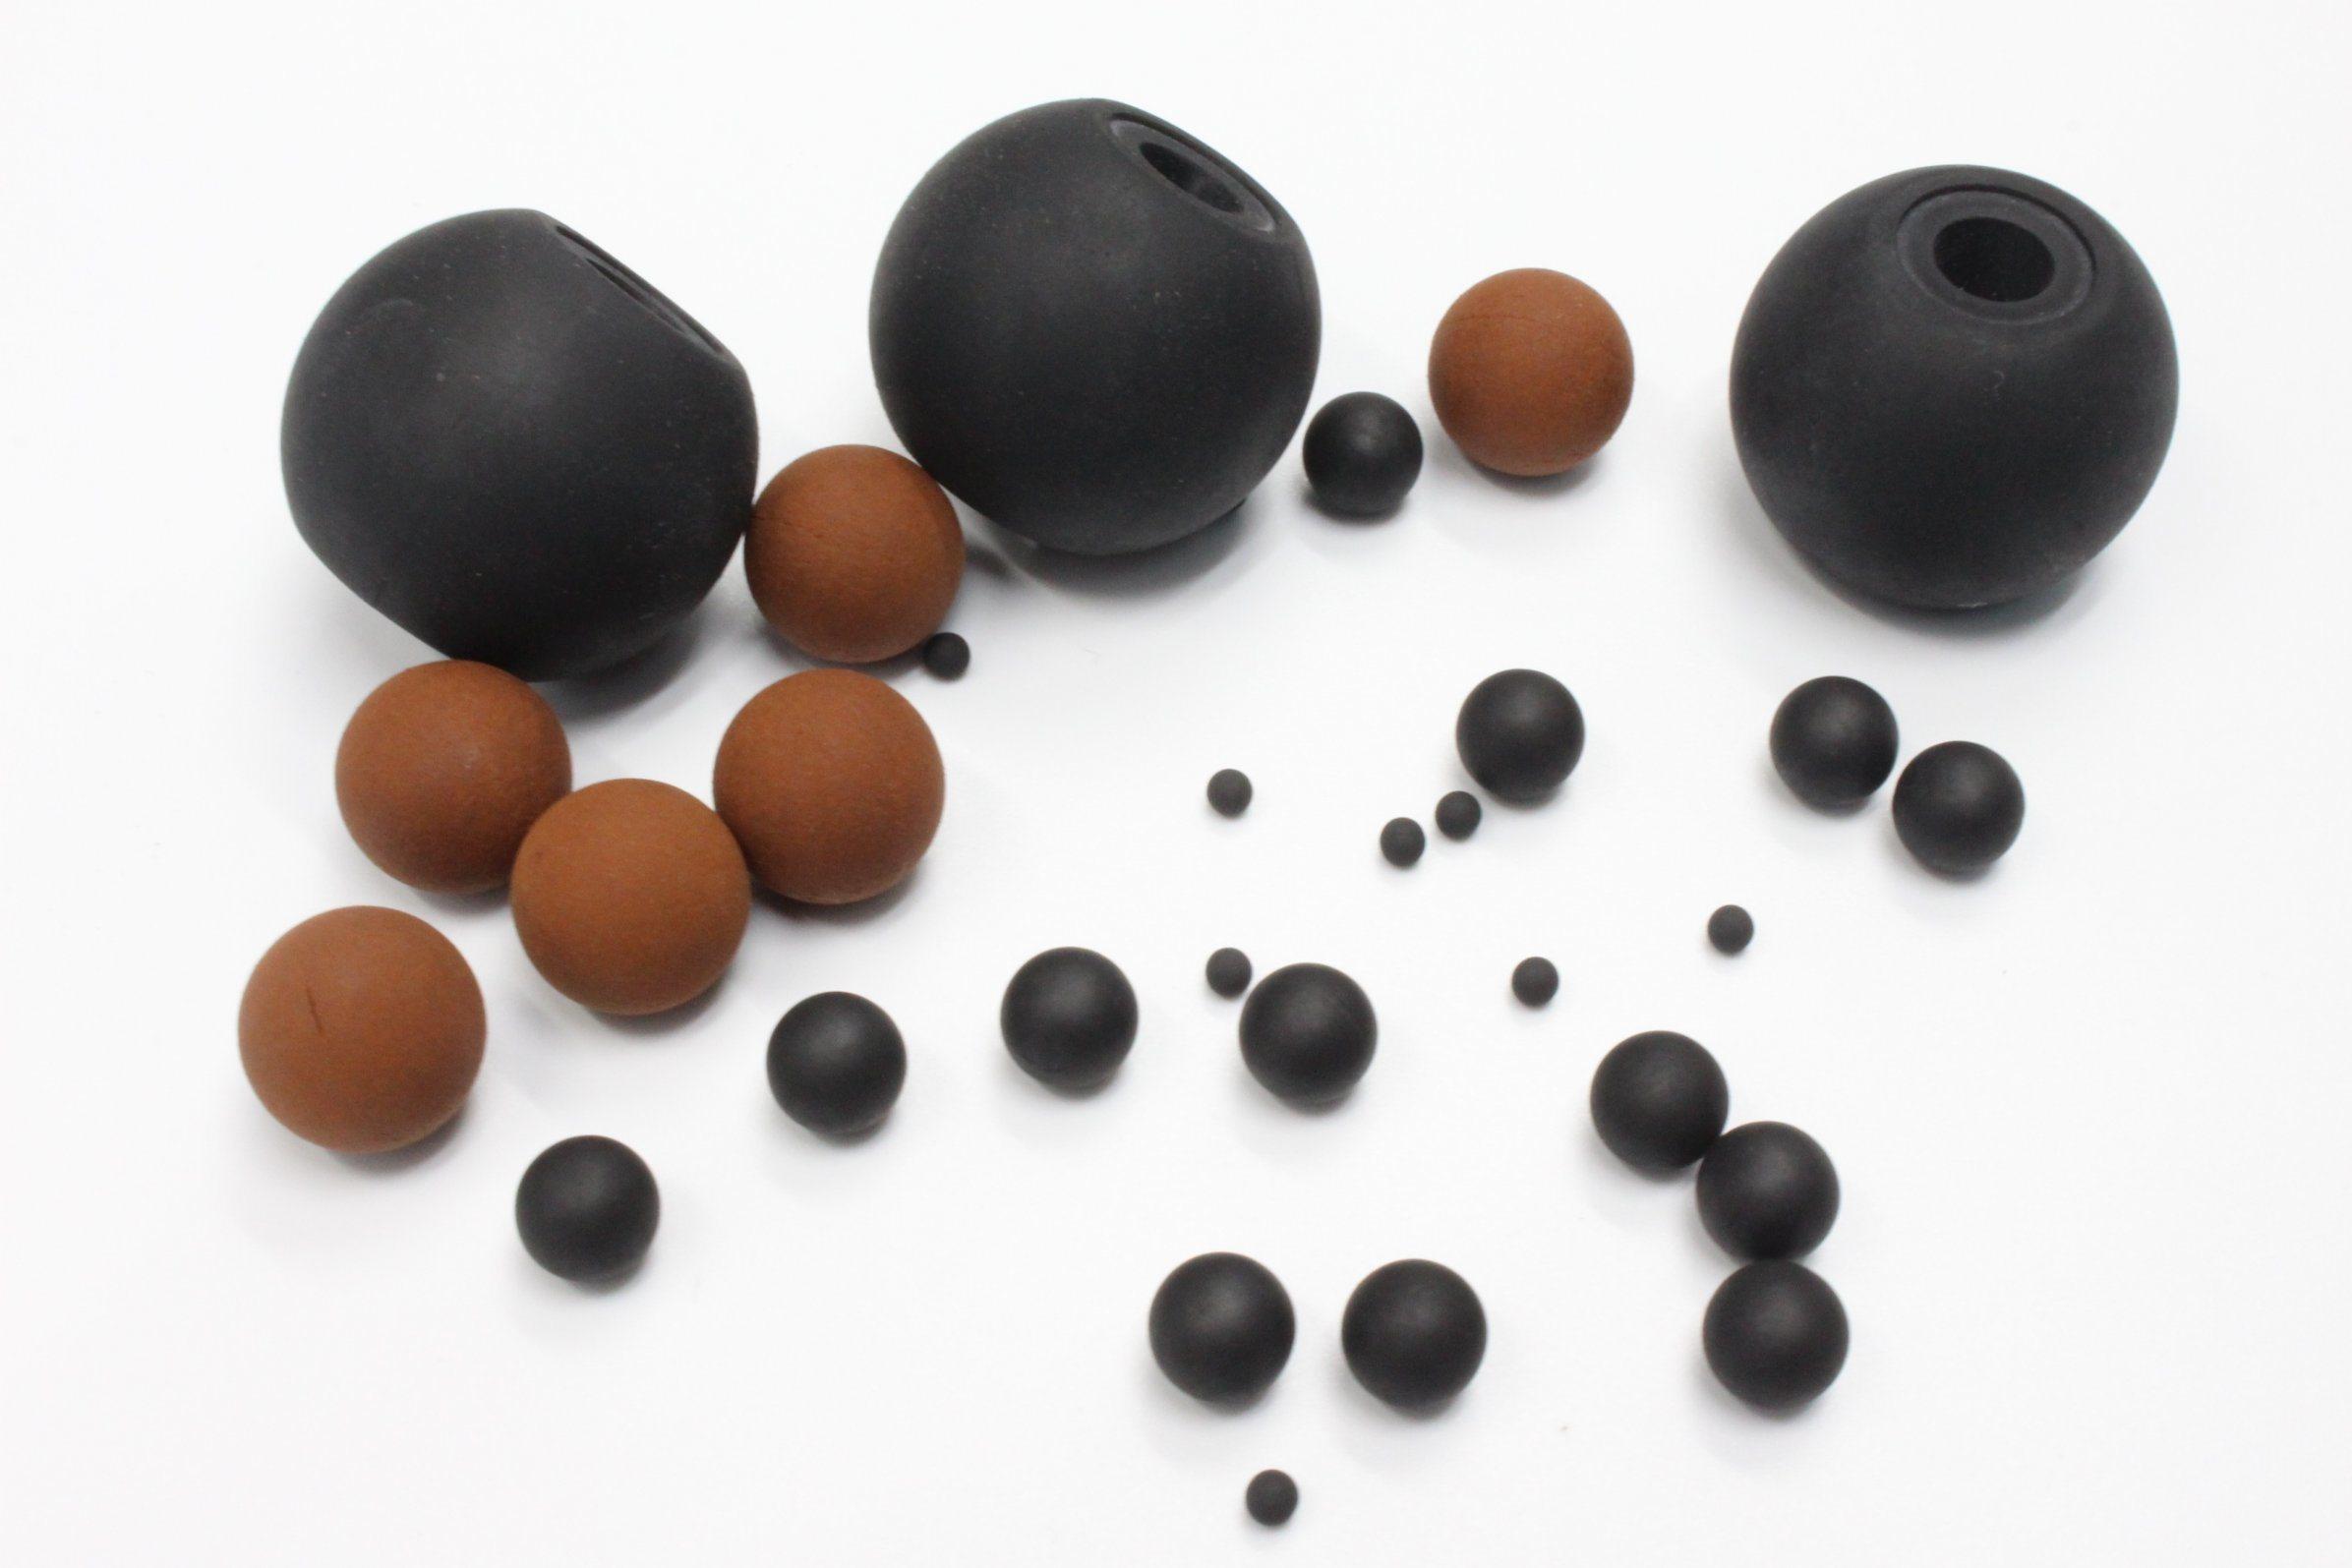 NBR Viton Nr Silicone Rubber Ball